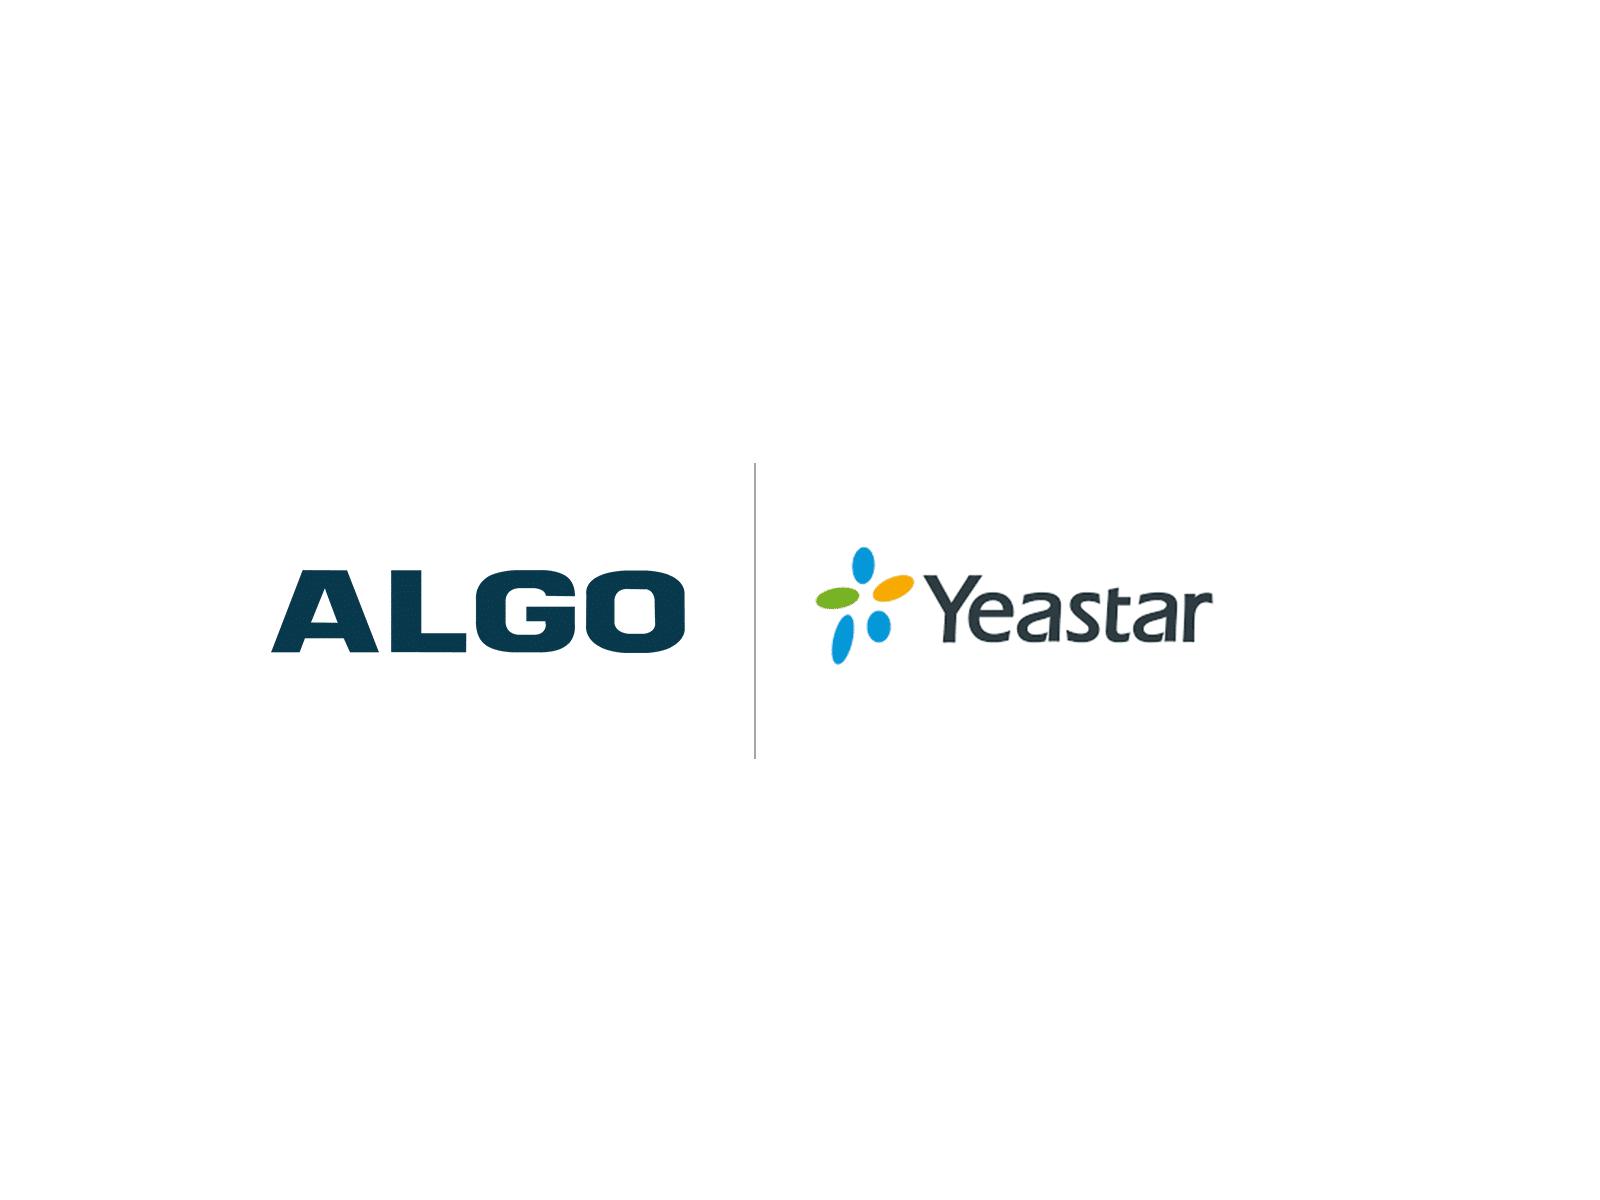 Algo Yeastar Compatibility Logo